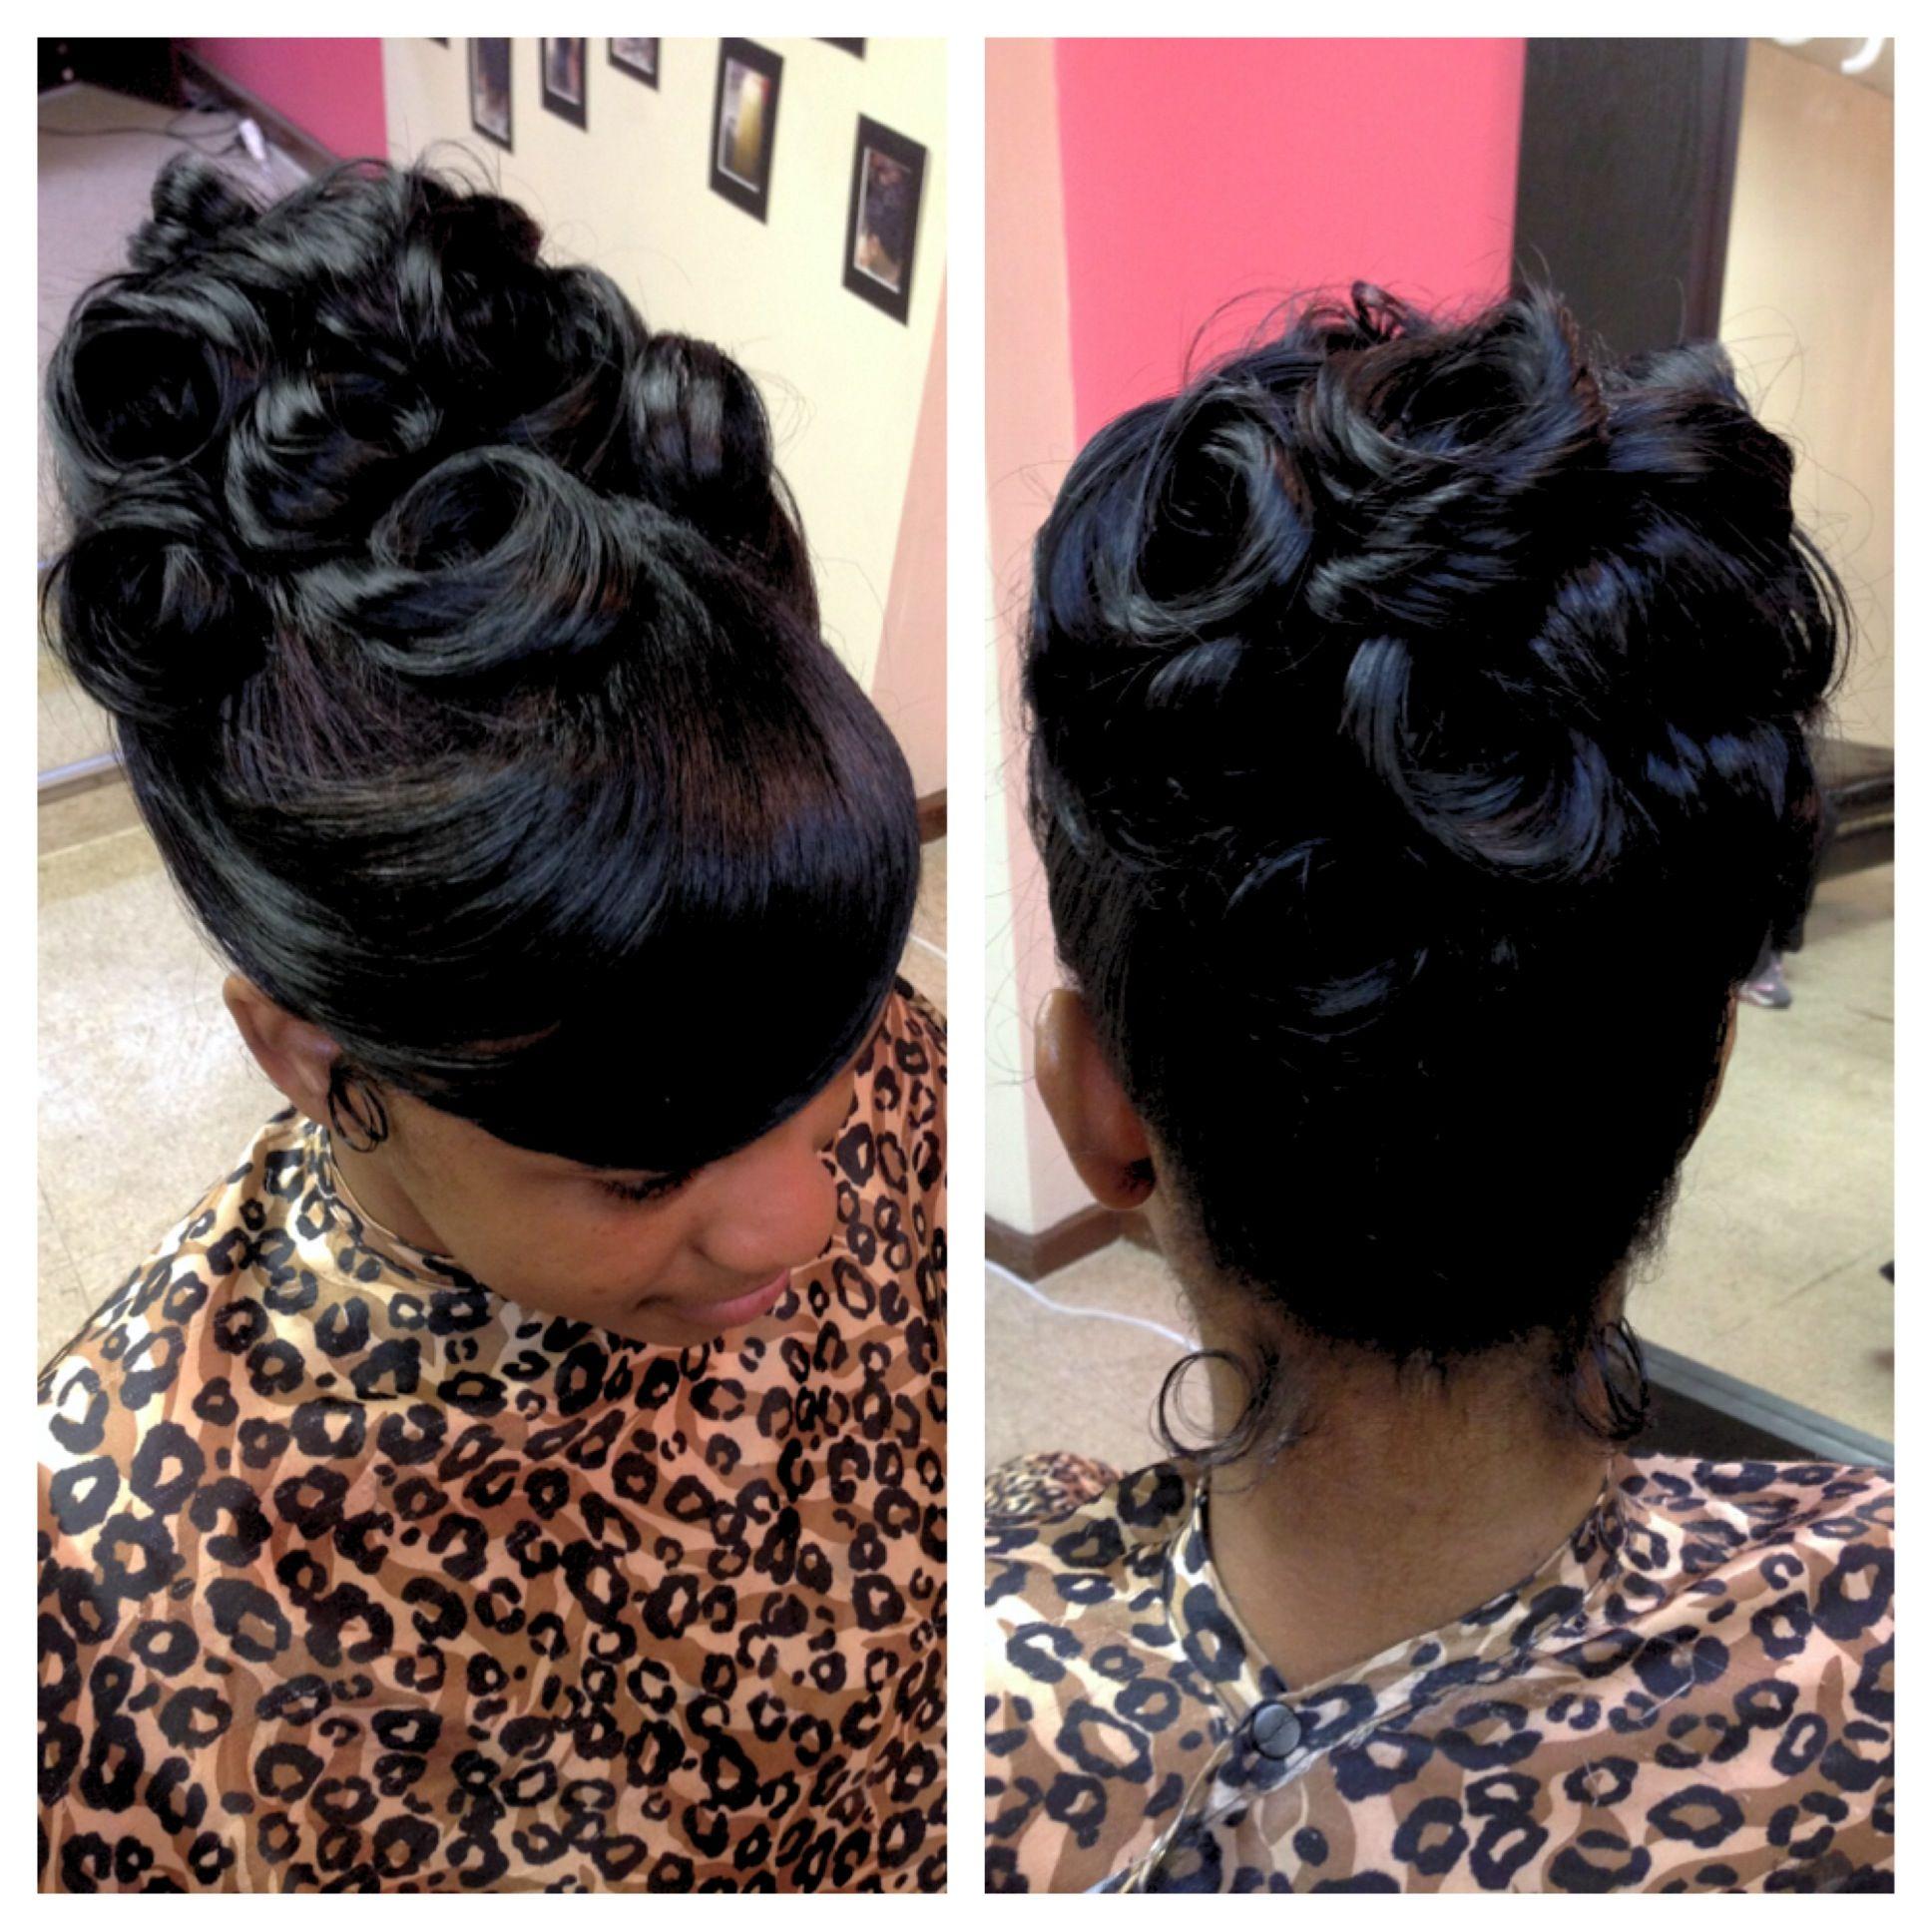 Up Do Bun With Curls Fabulous 3 Gamfactoryhairsalon Releaseyourinnerglam Glam Masterstylistnicky Prom Hairstyles Diy Hair Bun Hair Styles Prom Hair